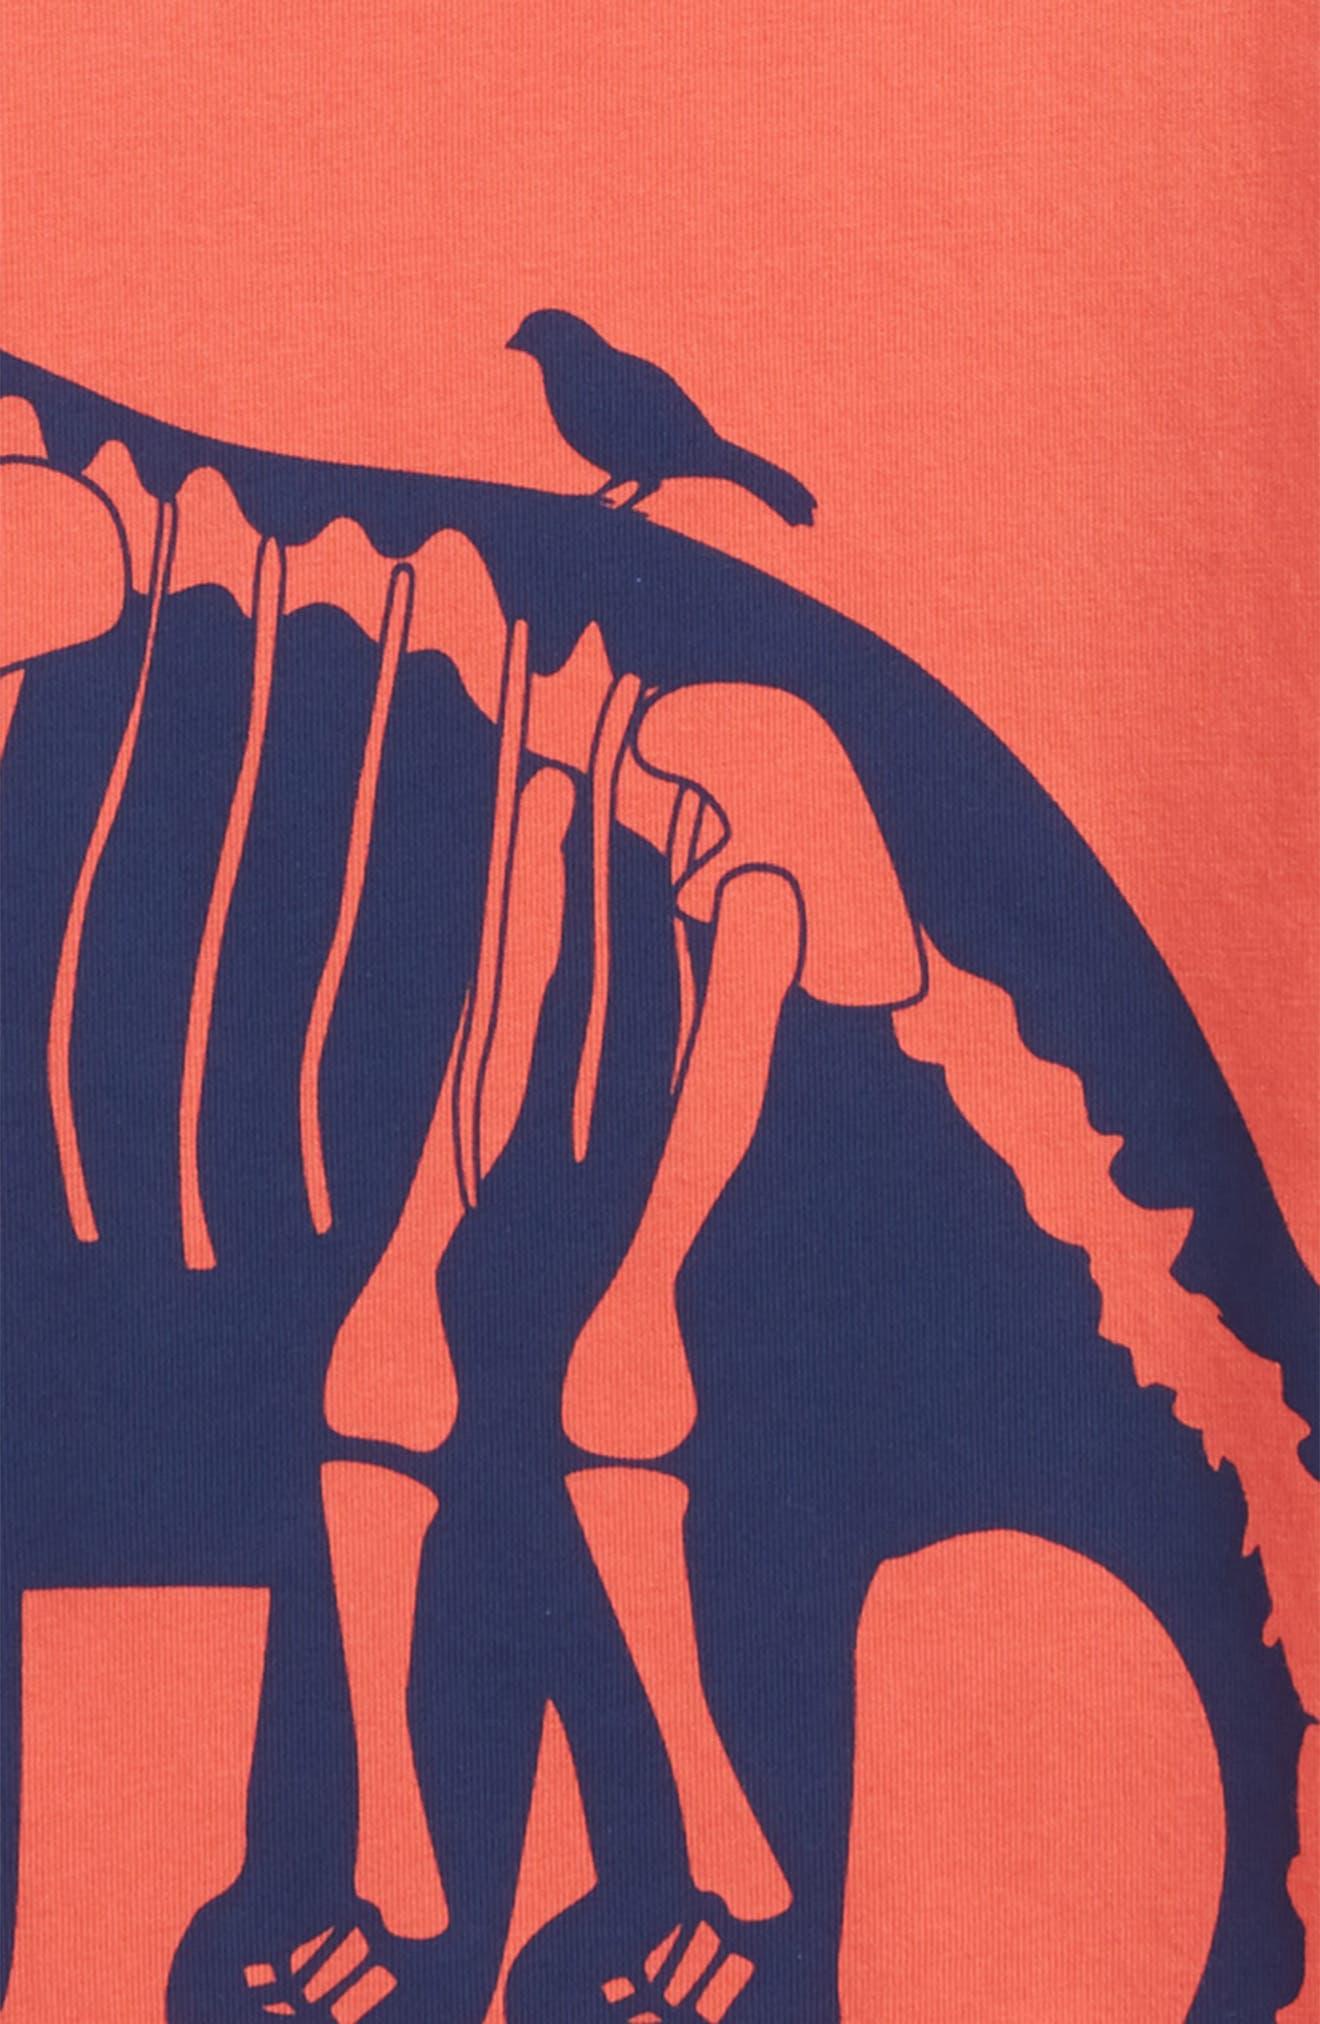 MINI BODEN,                             Wraparound Dinosaur Graphic T-Shirt,                             Alternate thumbnail 3, color,                             614